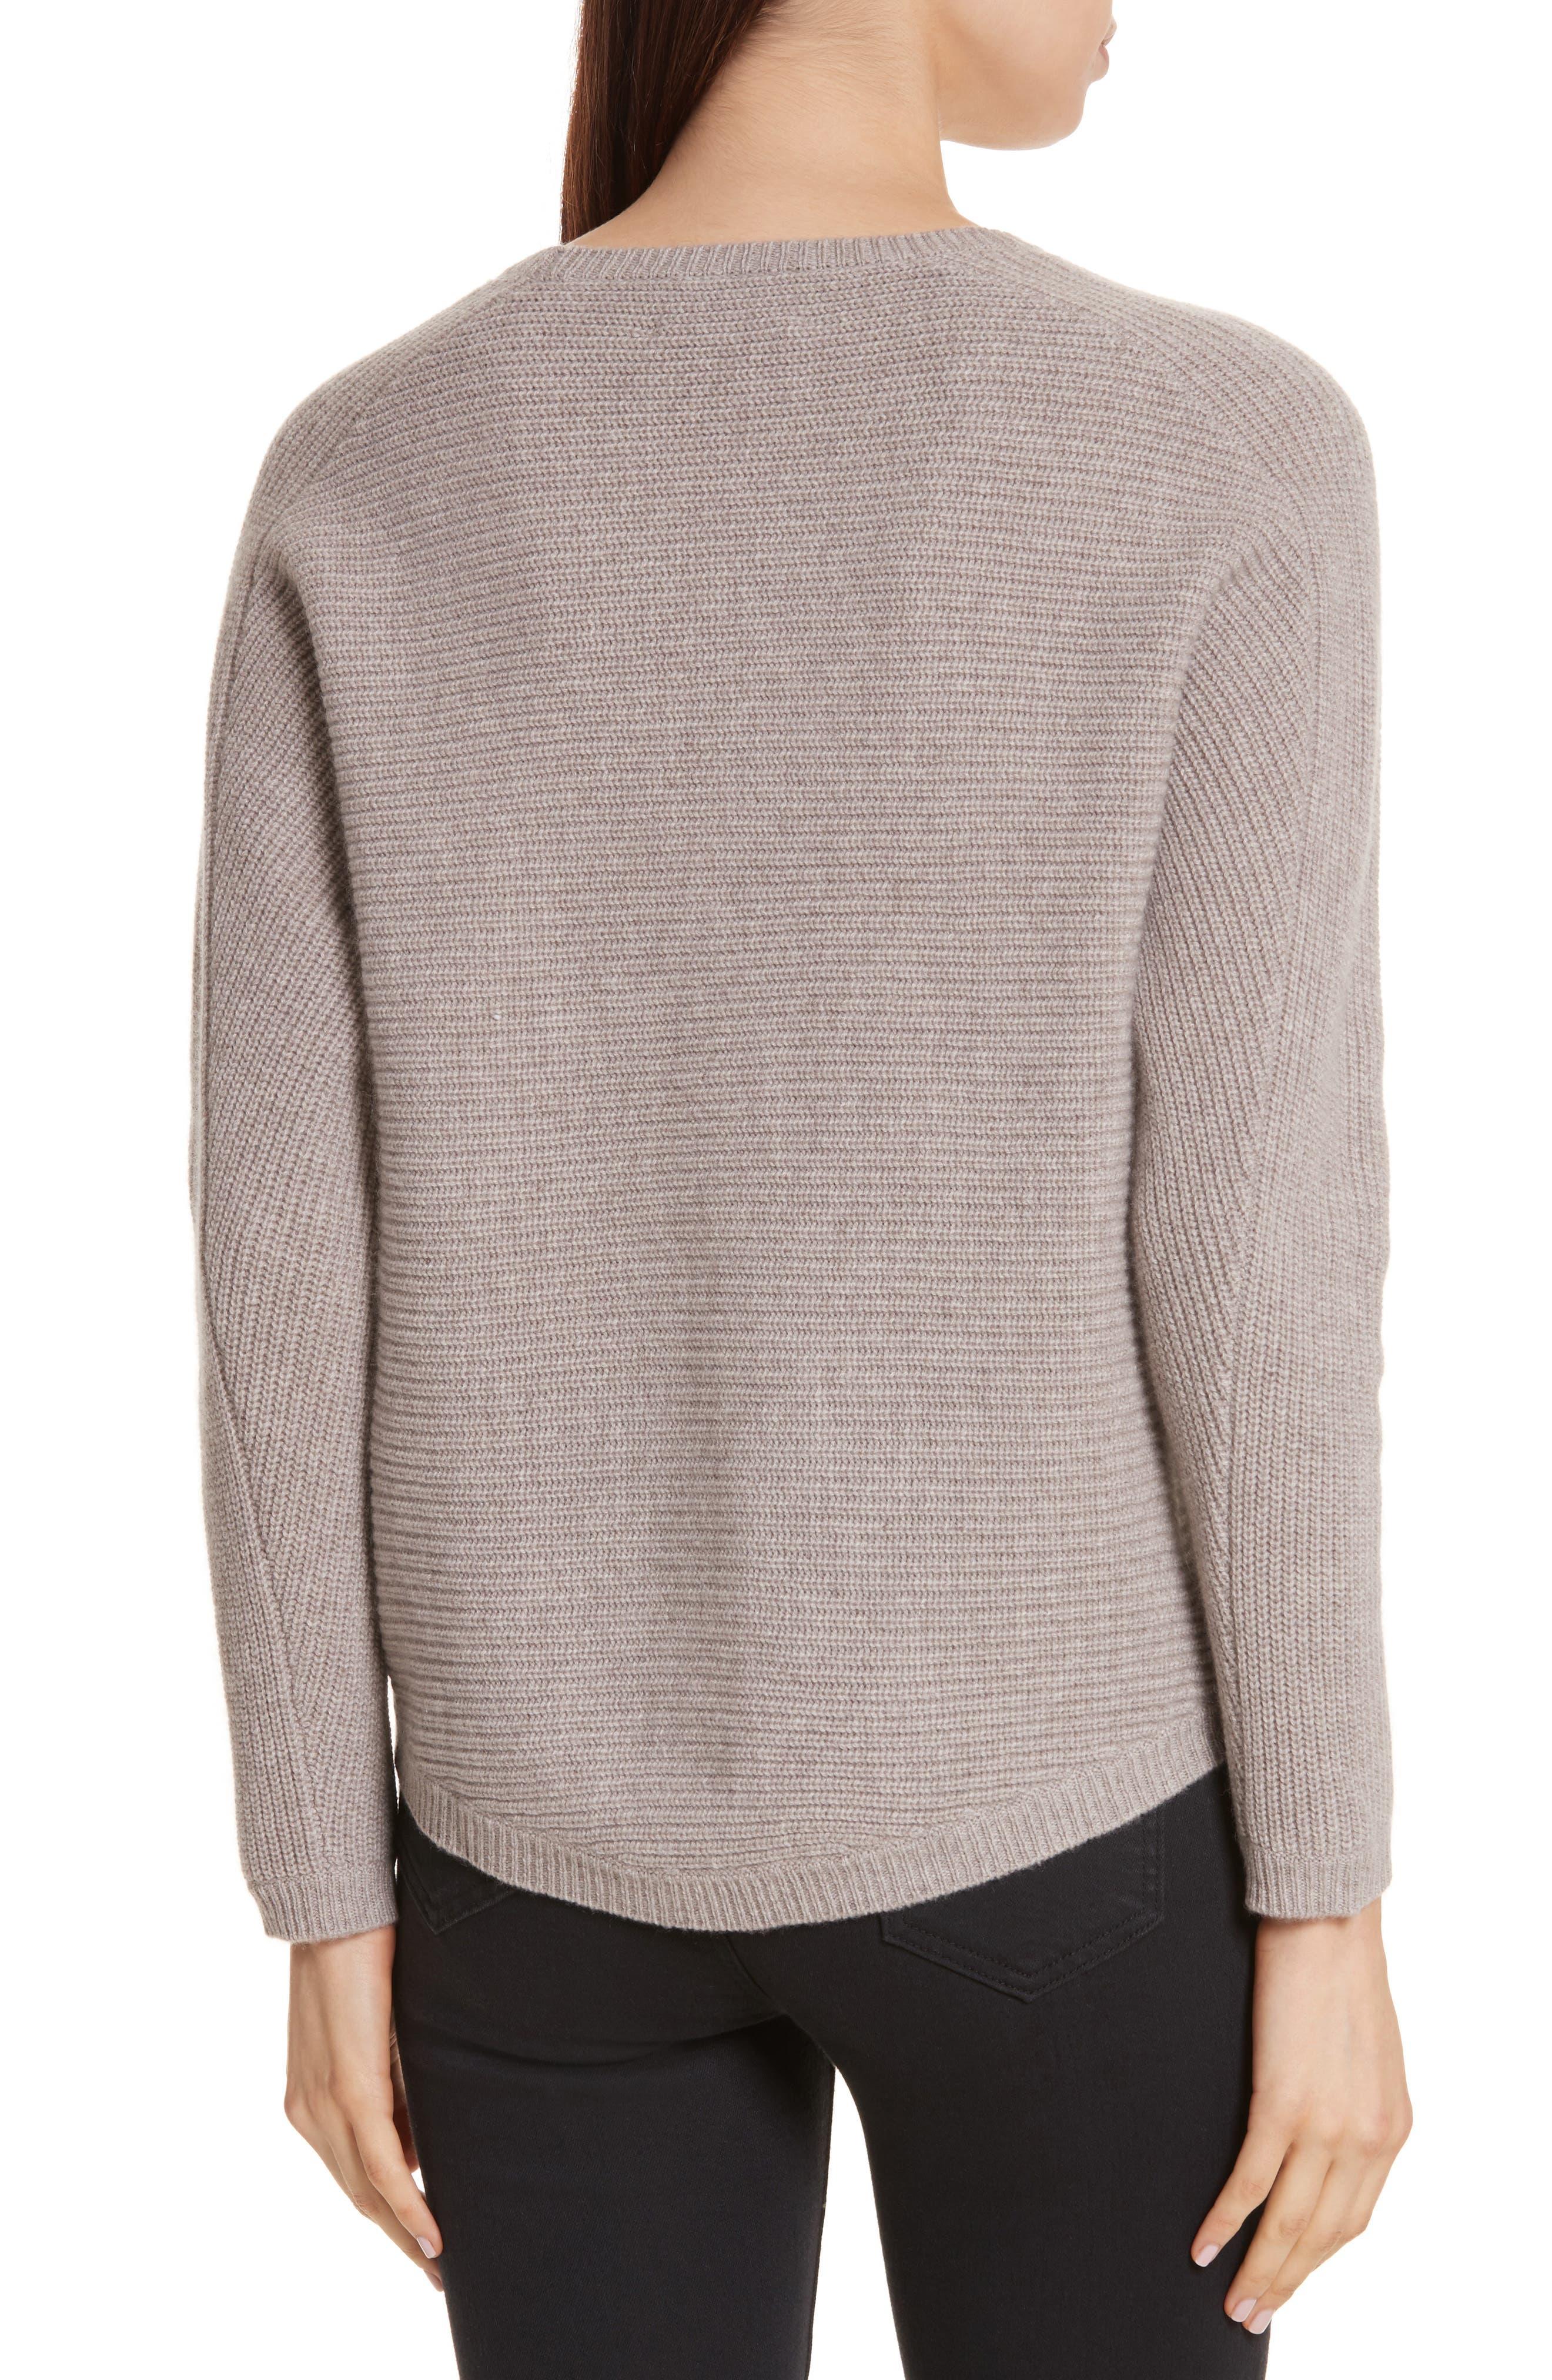 Alternate Image 2  - Allude Merino Wool & Cashmere Braid Detail Sweater